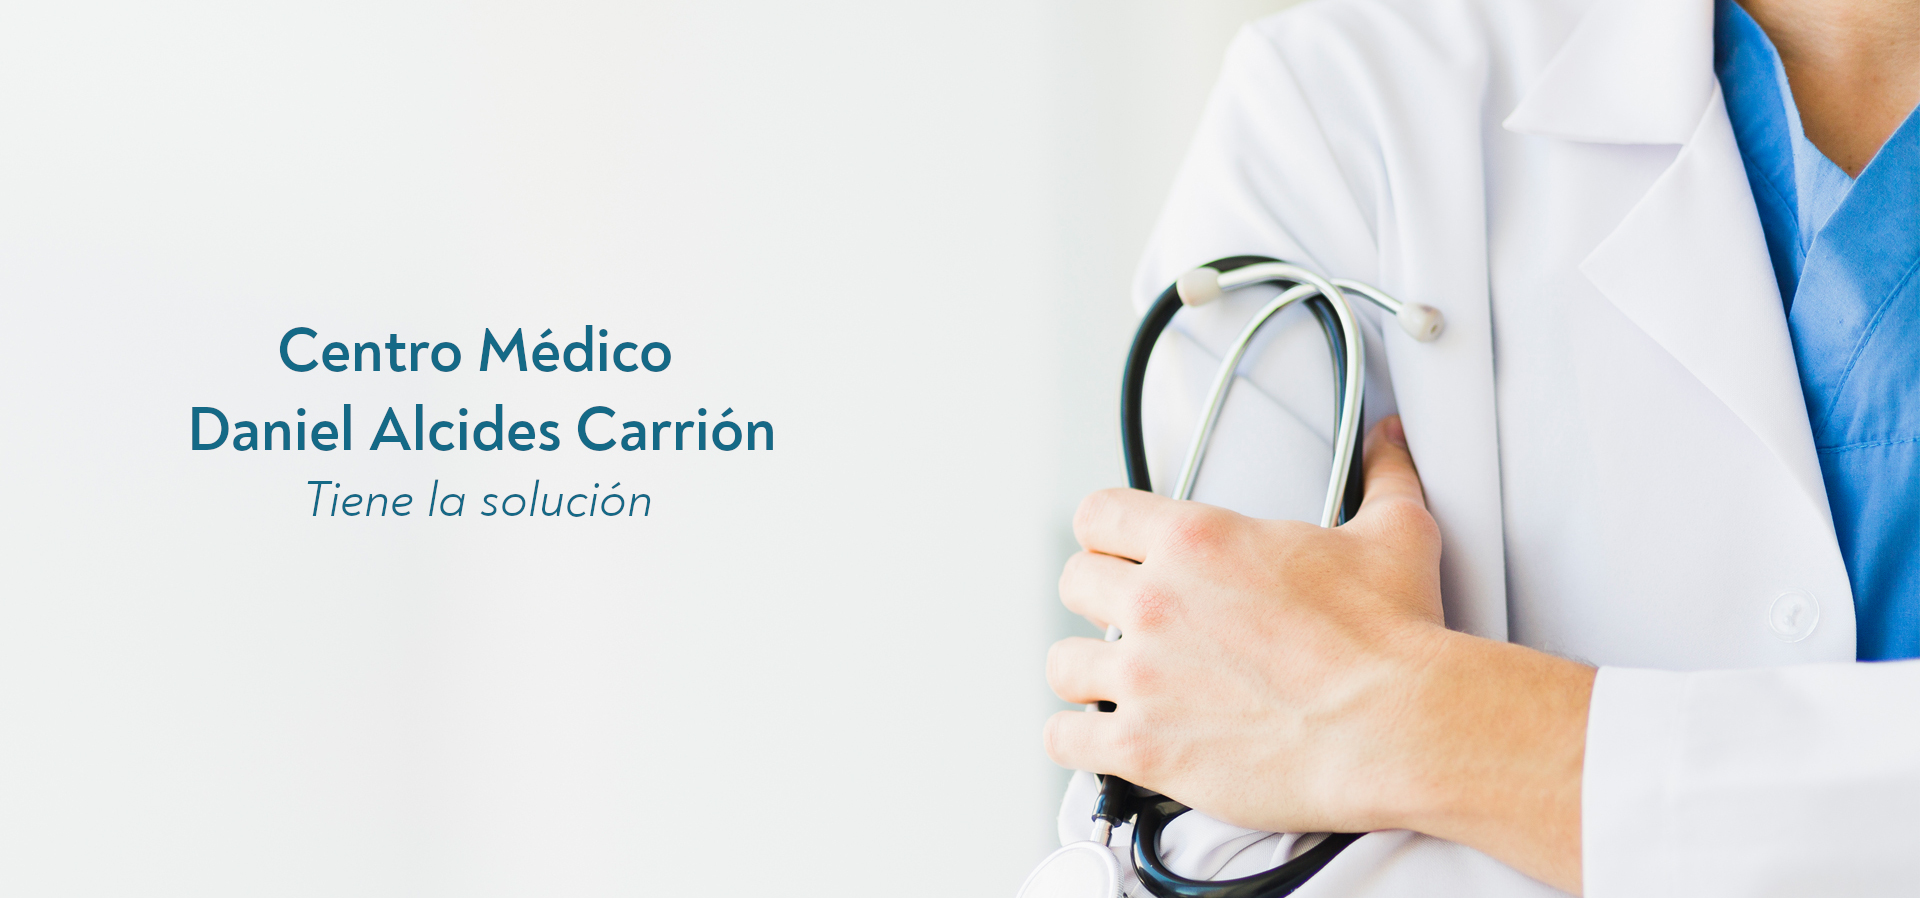 Centro Médico Daniel Alcides Carrión